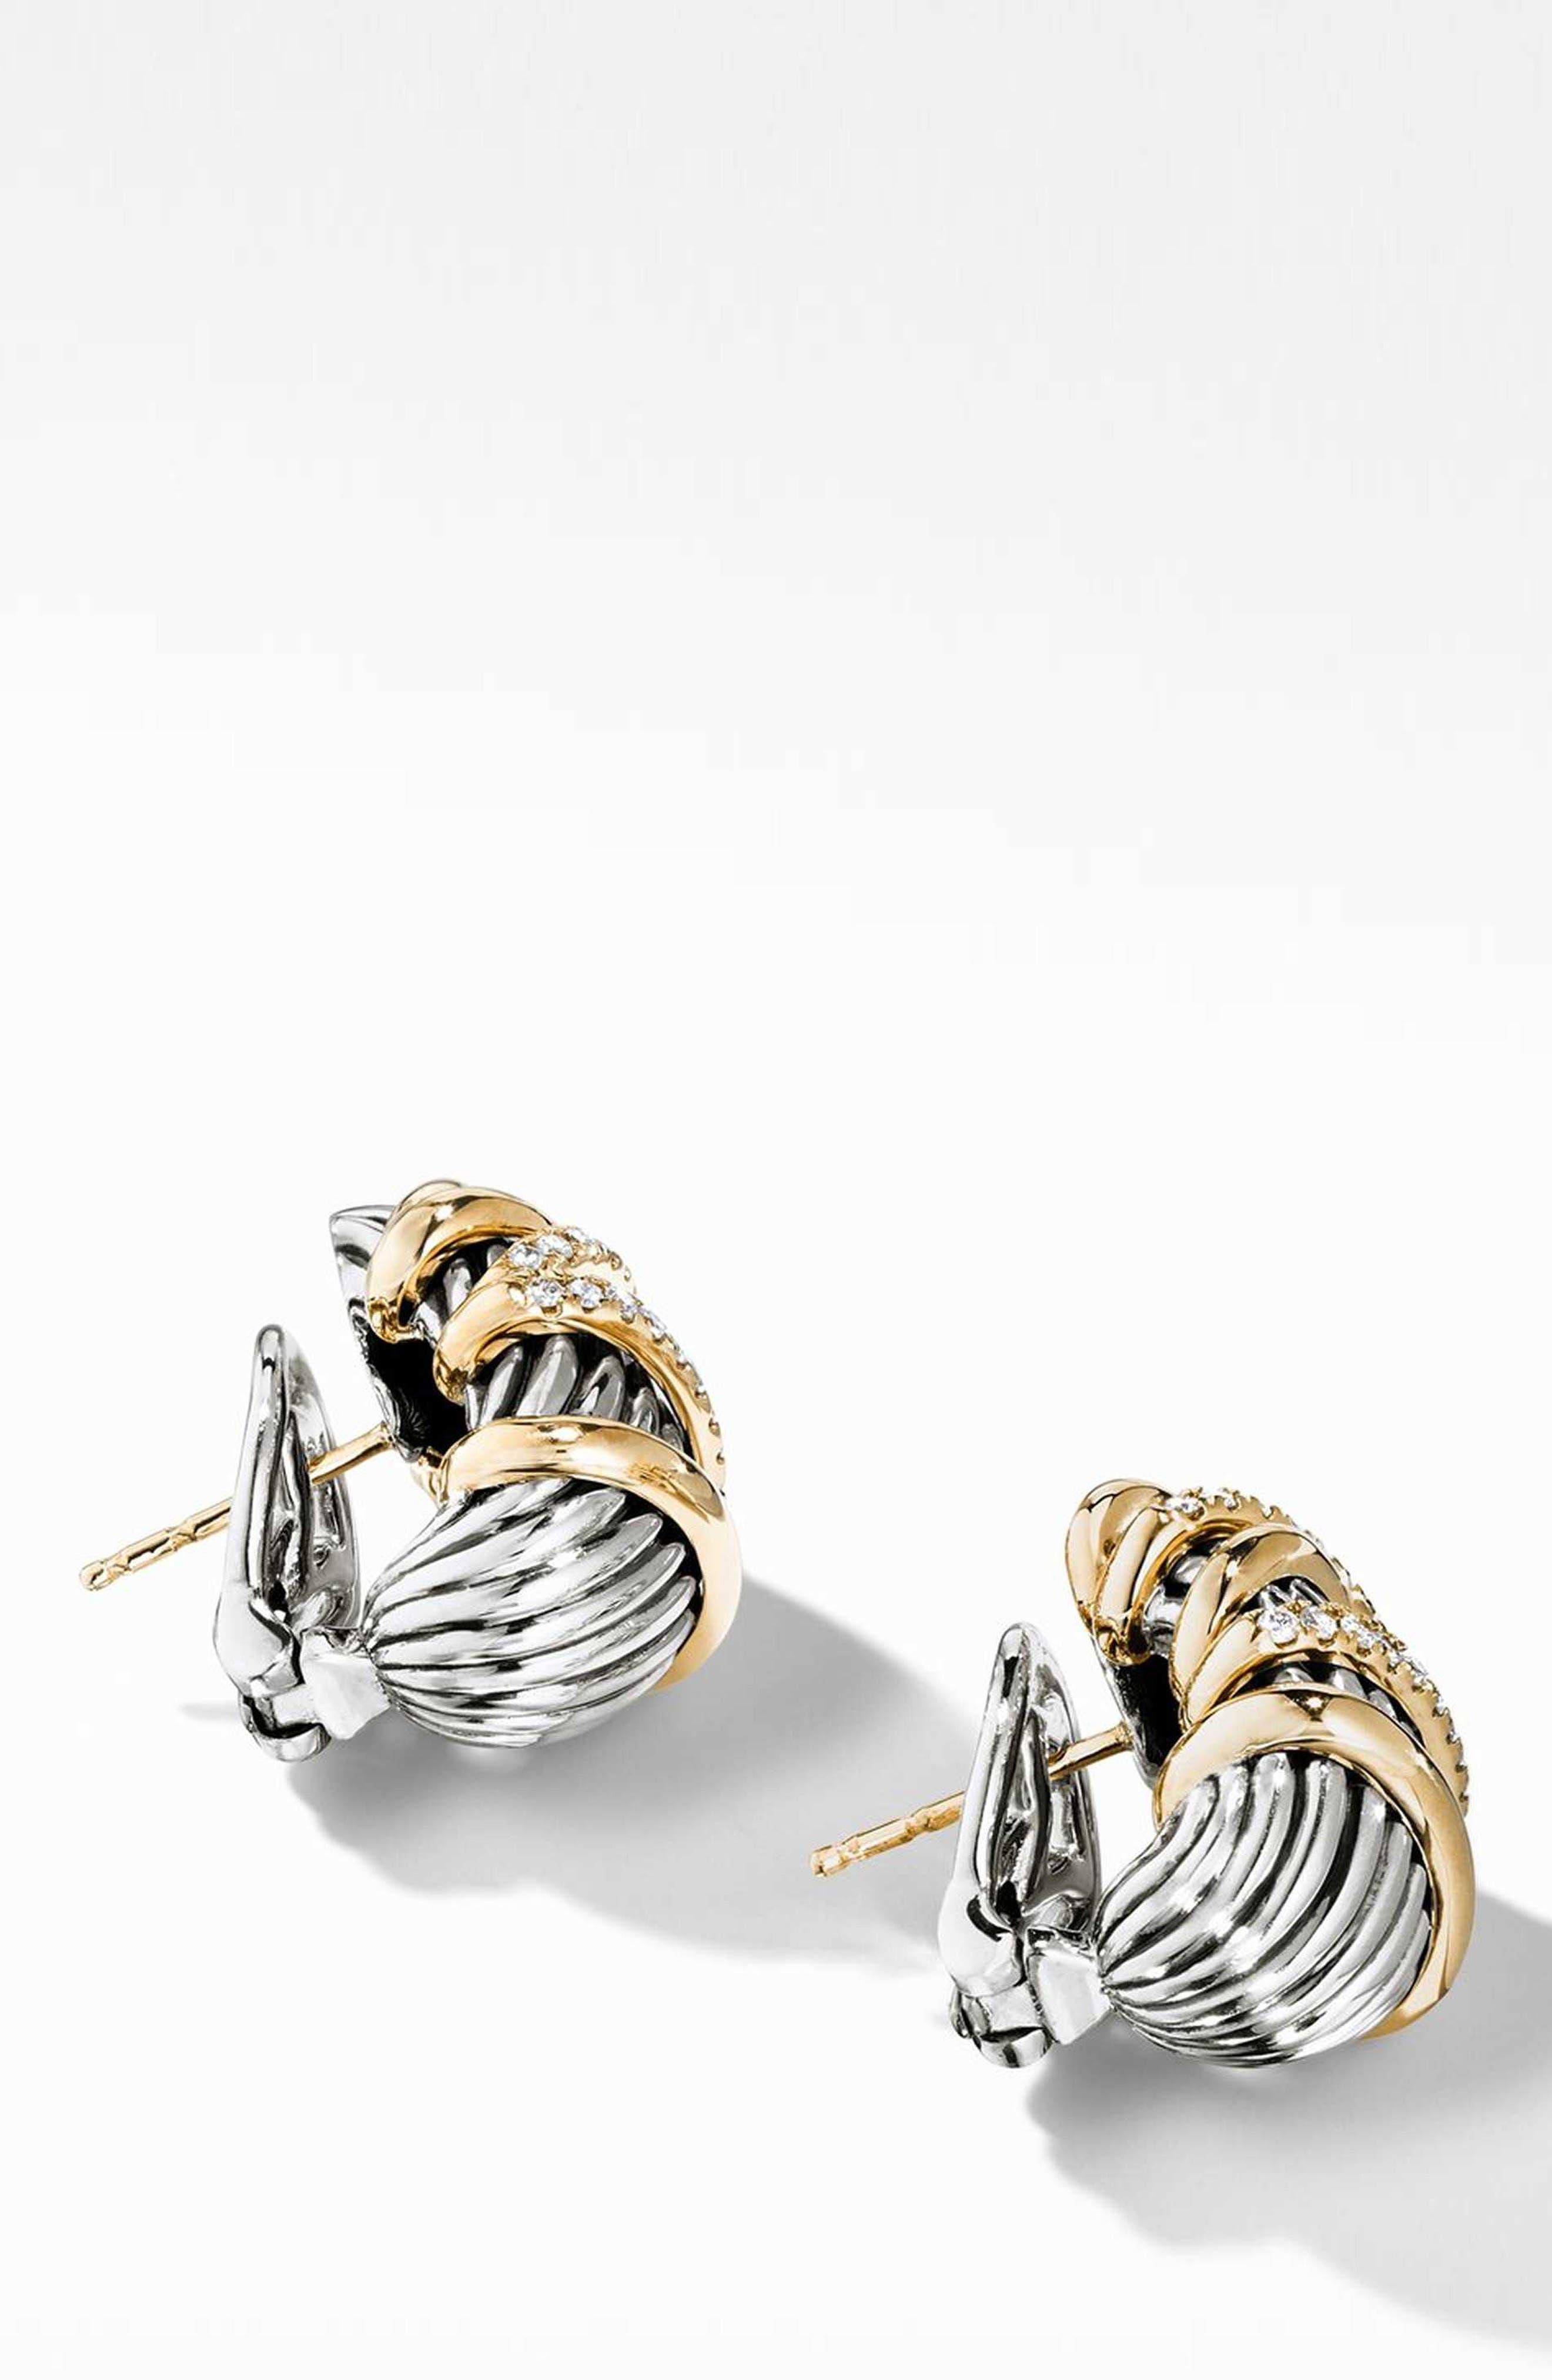 DAVID YURMAN Helena Shrimp Earrings with 18K Gold and Diamonds, Main, color, GOLD/ SILVER/ DIAMOND